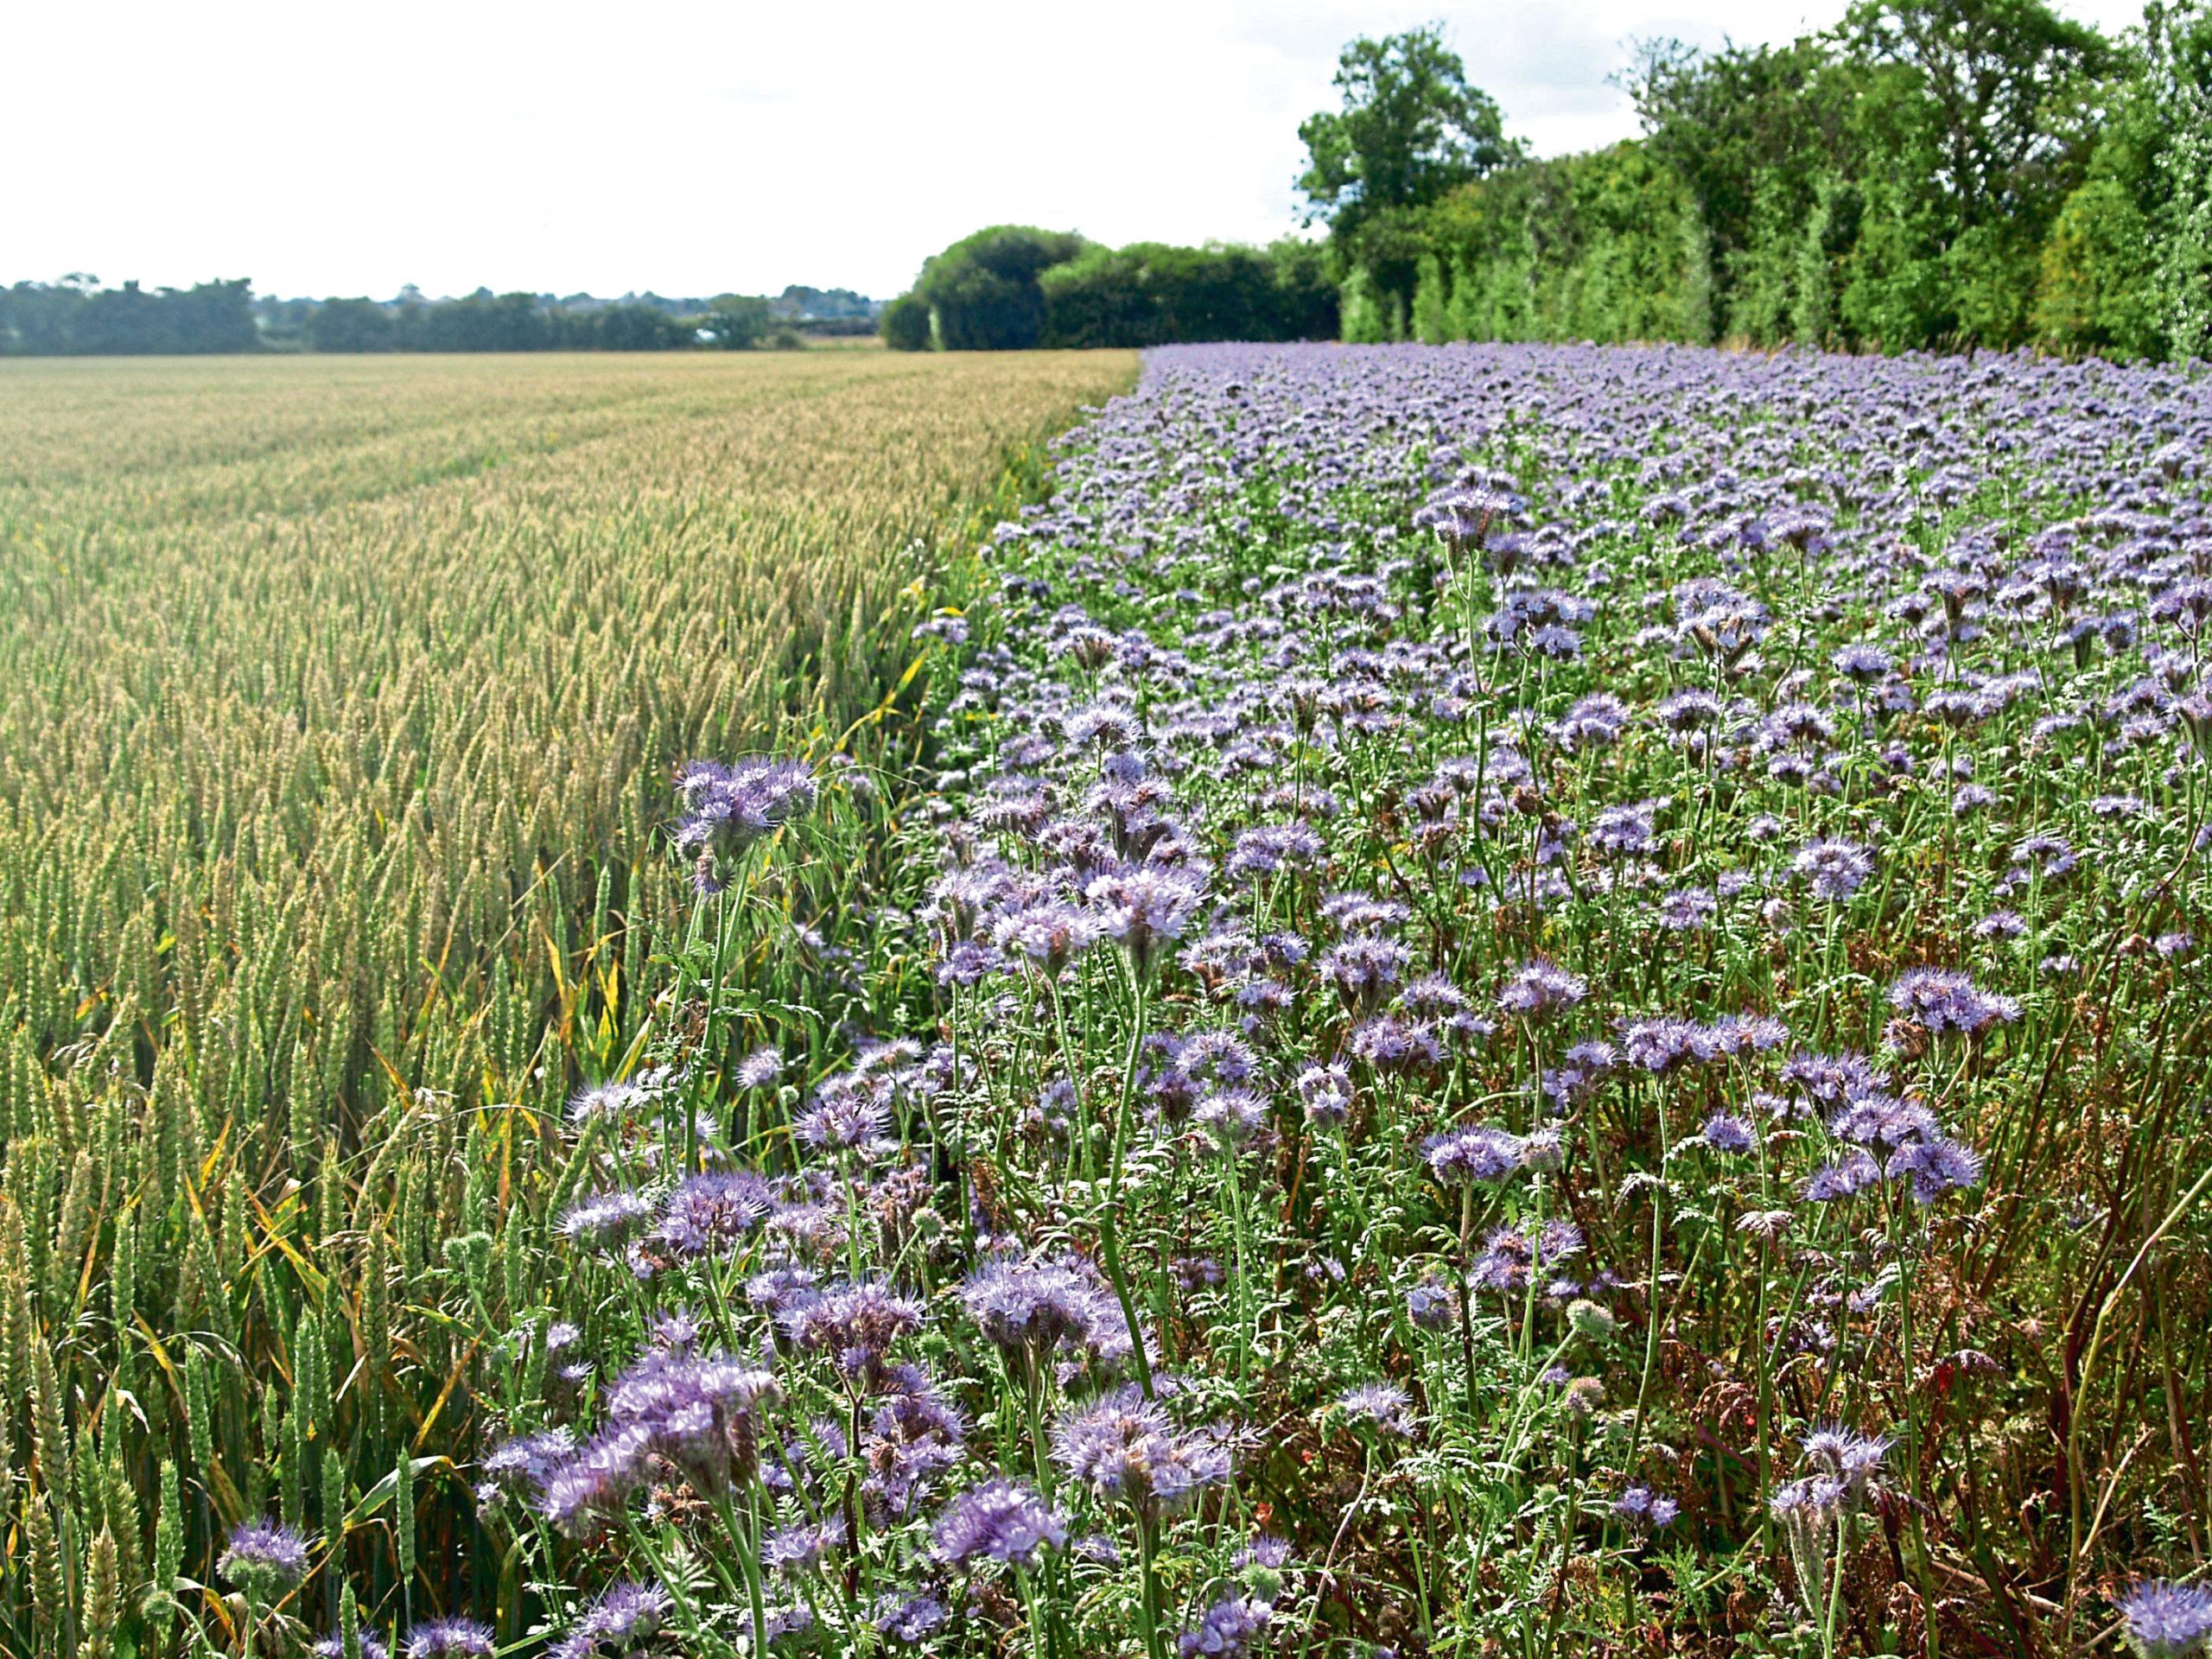 A cover crop of phacelia growing in a field margin.